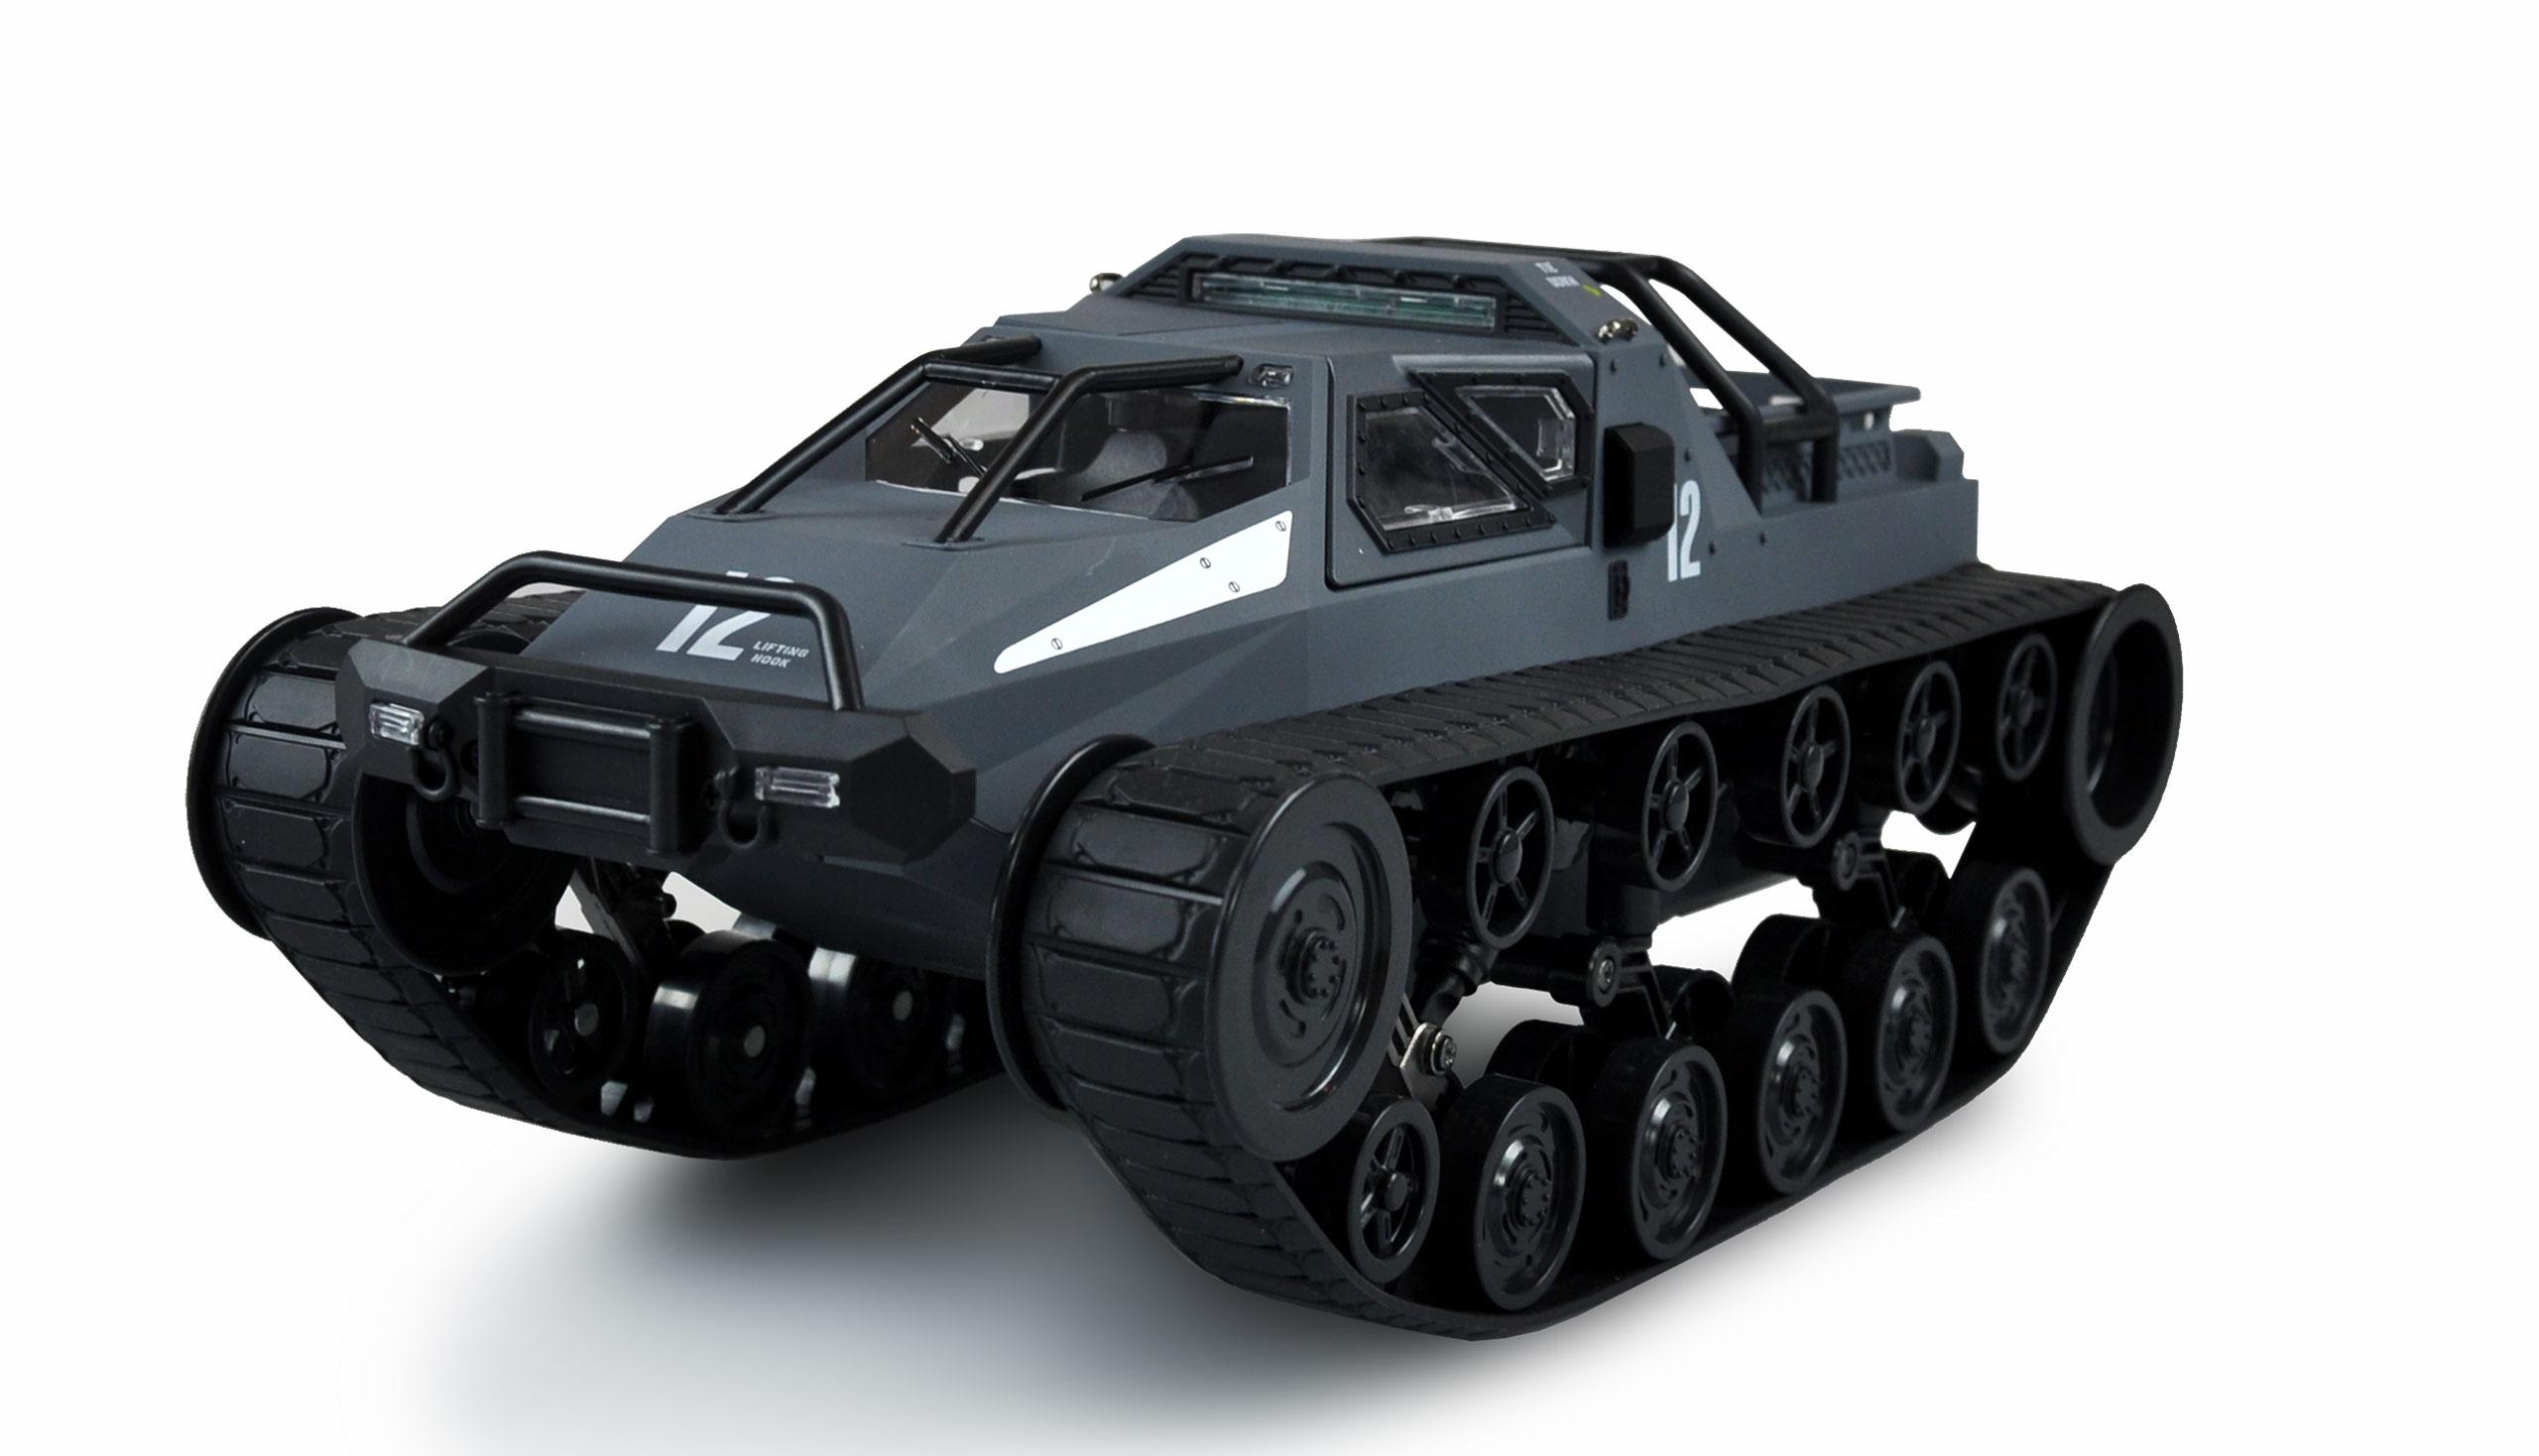 Vorschau: Amewi Military Police Kettenfahrzeug Grau - Elektromotor - 1:12 - Betriebsbereit (RTR) - Blau - Grau - Junge/Mädchen - 14 Jahr(e)